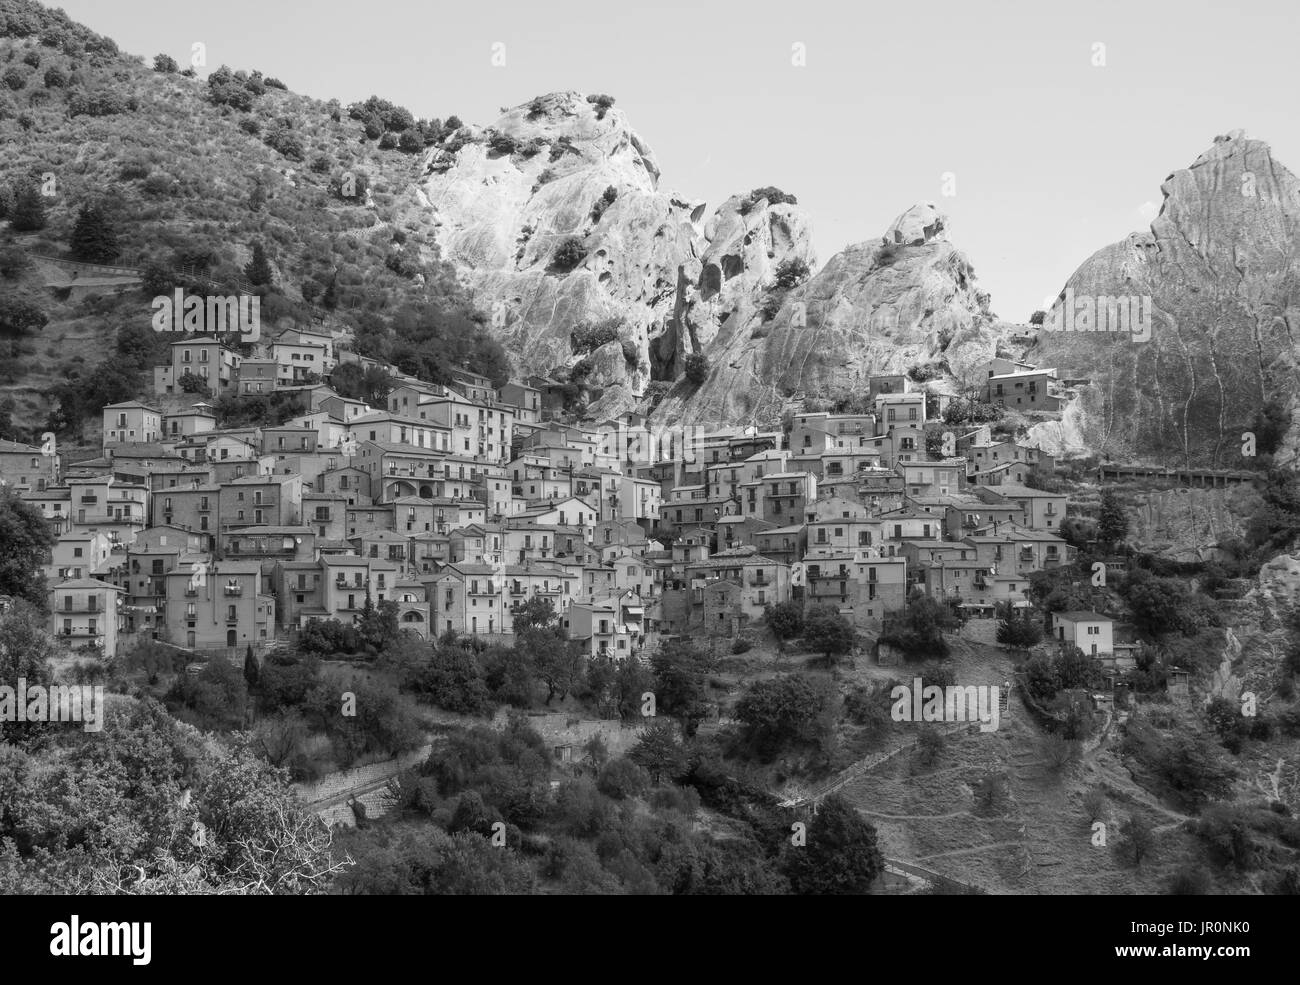 Castelmezzano (Italy) - A little altitude village, dug into the rock in the natural park of the Dolomiti Lucane, Basilicata, famous for 'Angel Flight' - Stock Image